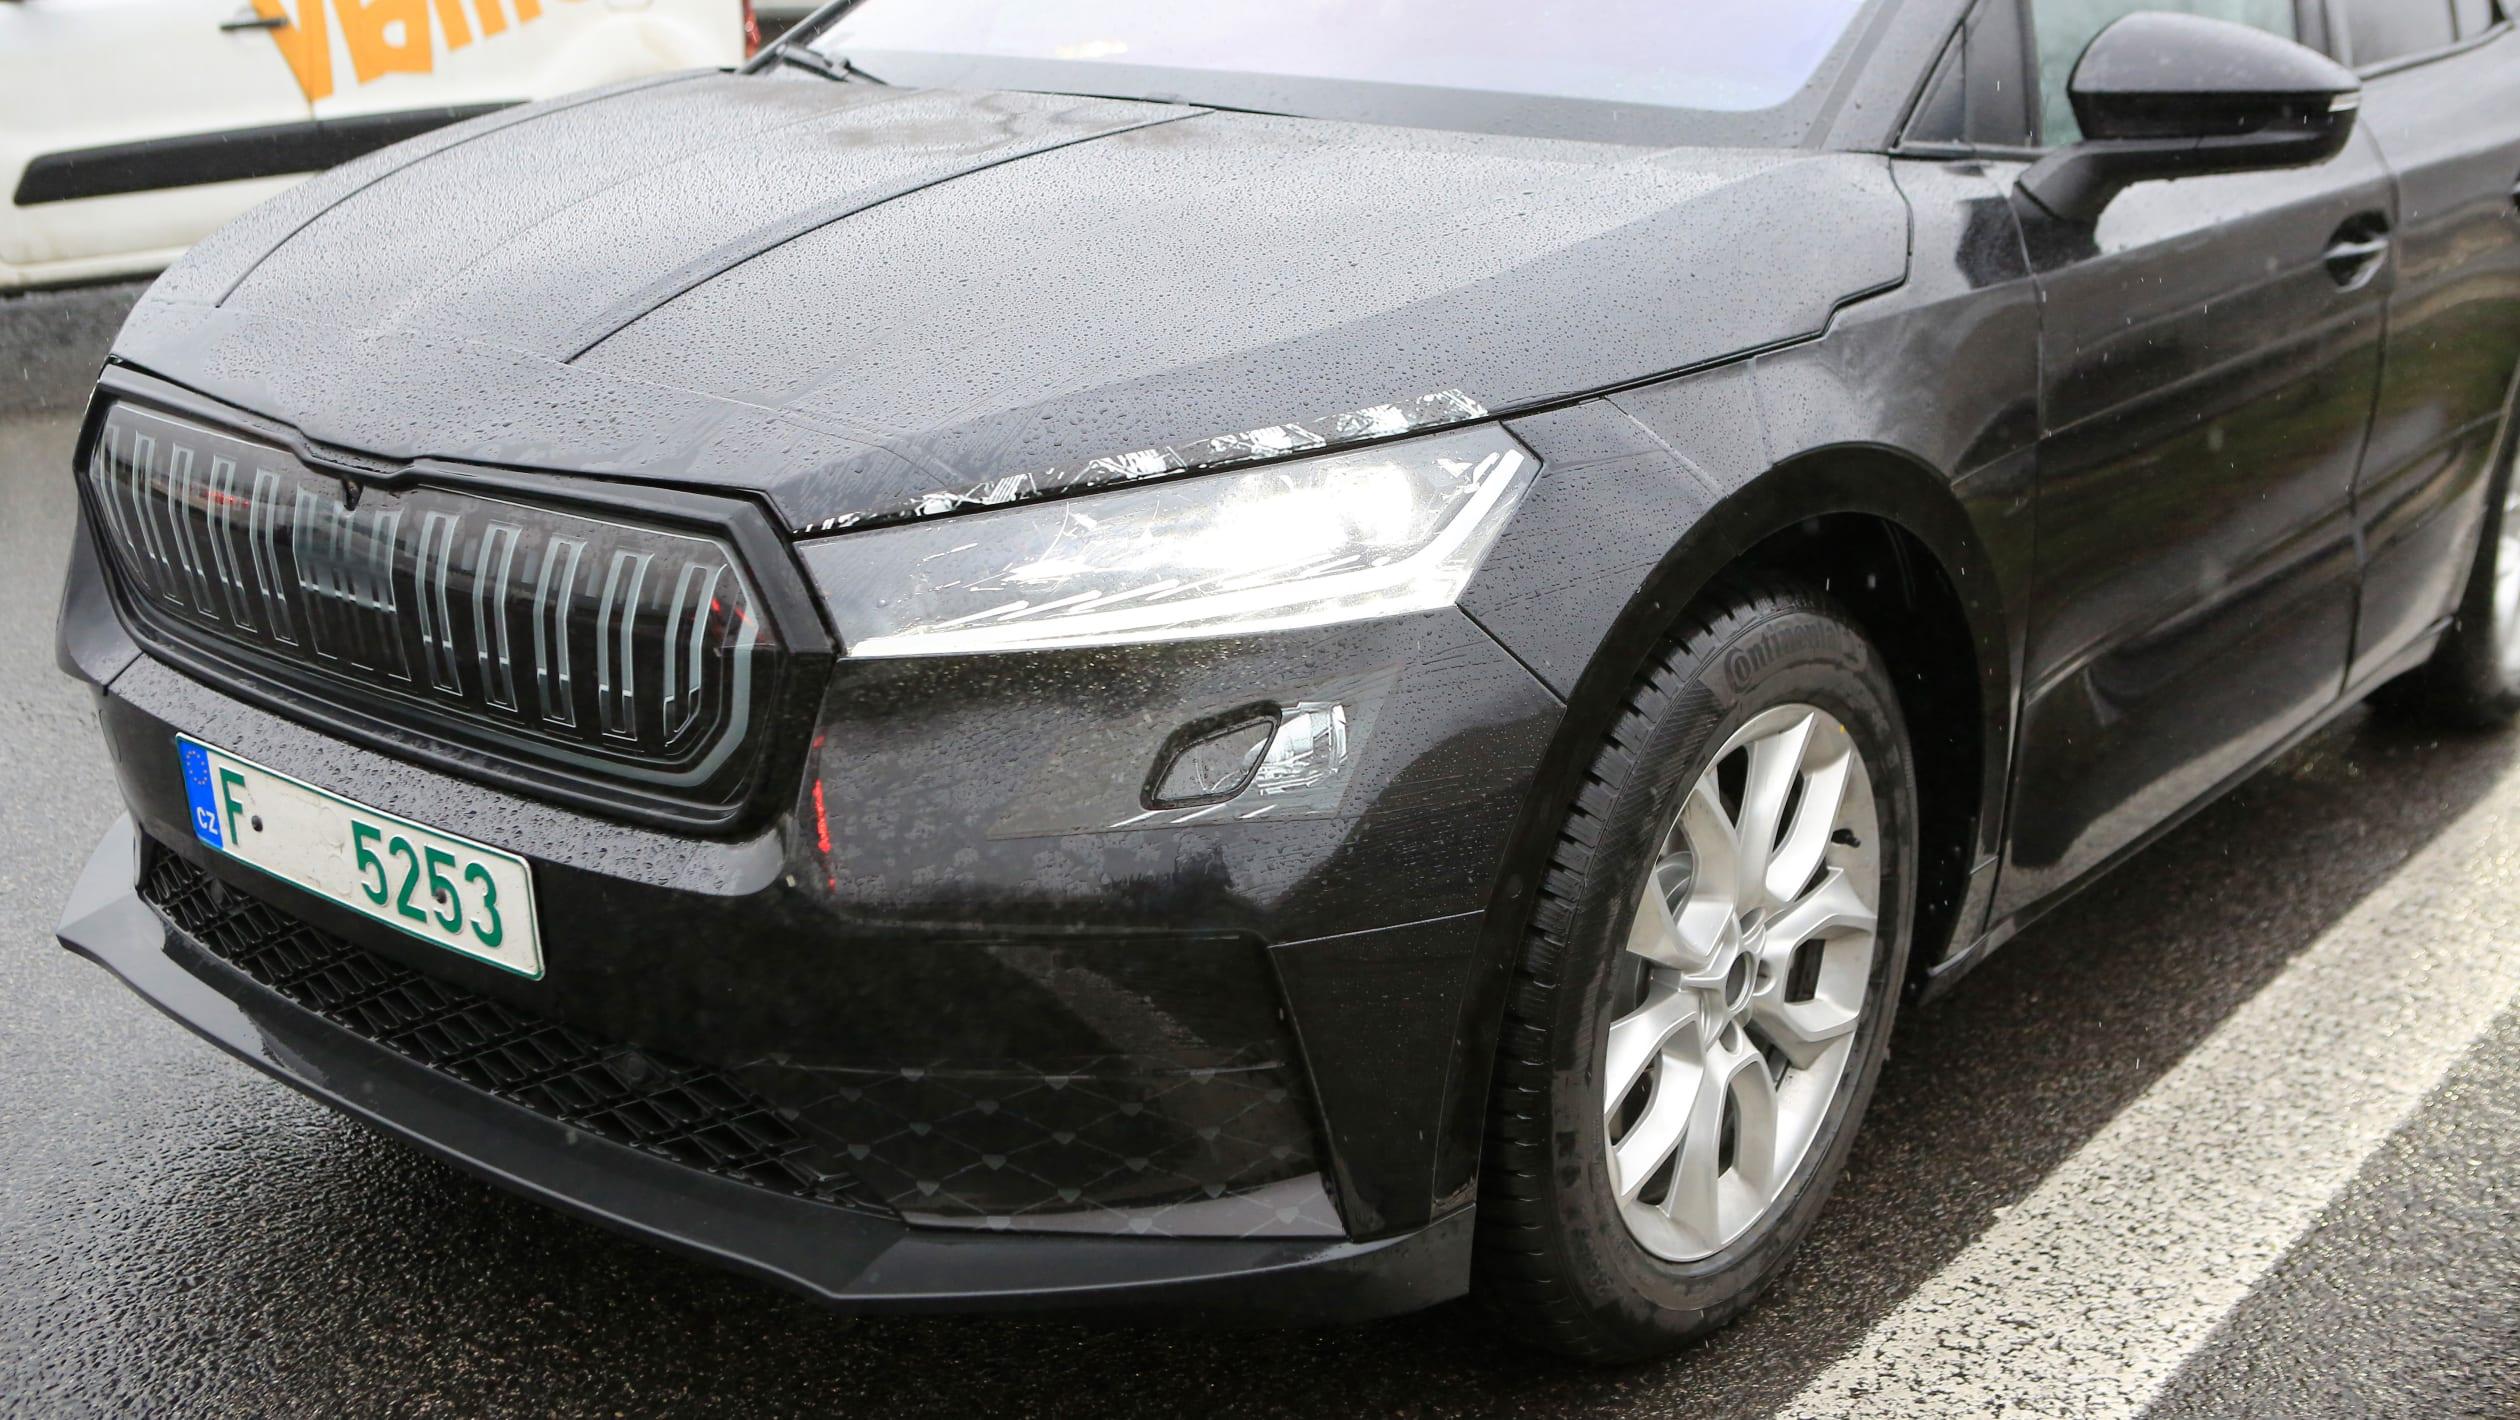 2021 - [Skoda] SUV EV - Page 3 2021%20Skoda%20Enyaq%20spied-12